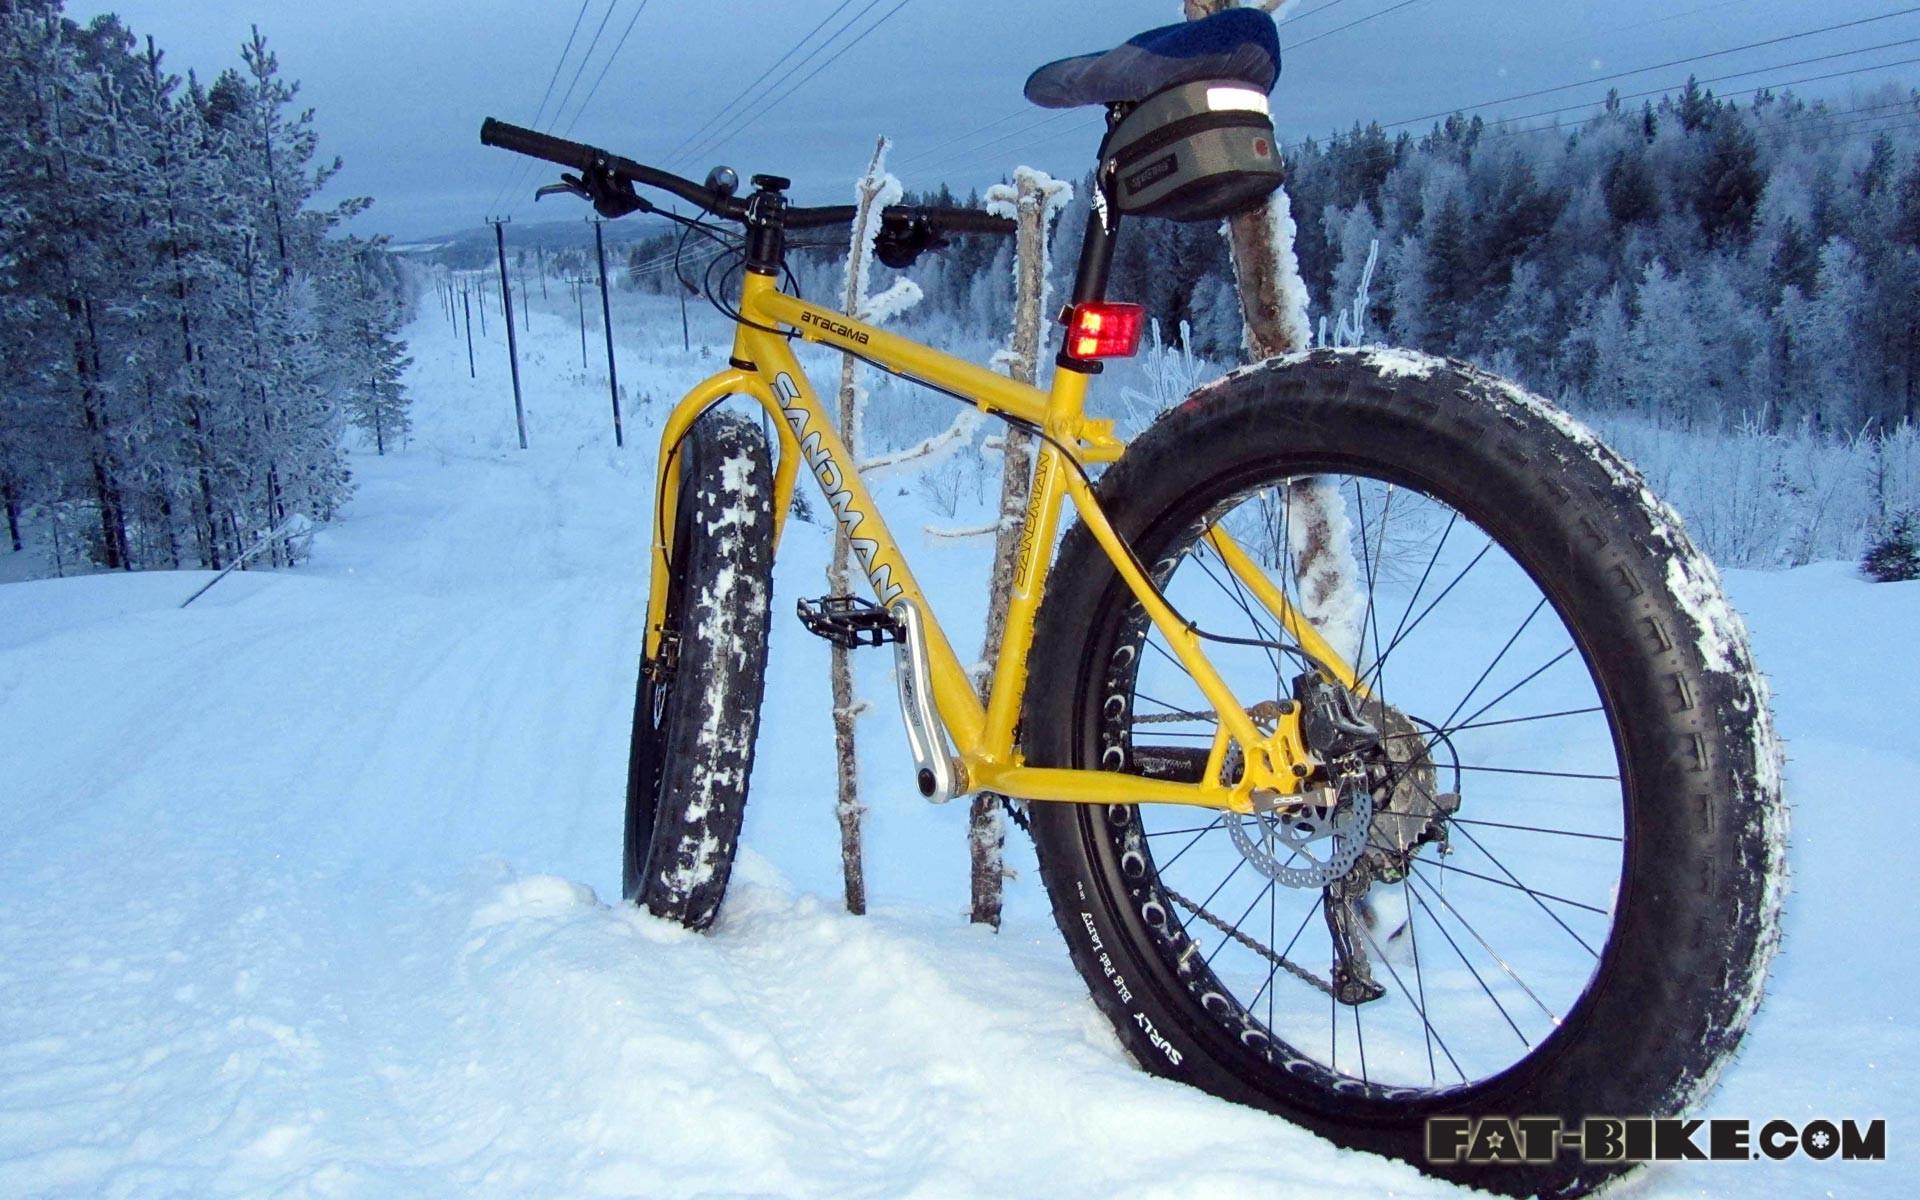 Res: 1920x1200, fat-bike-wallpaper-1920-1200-sweden